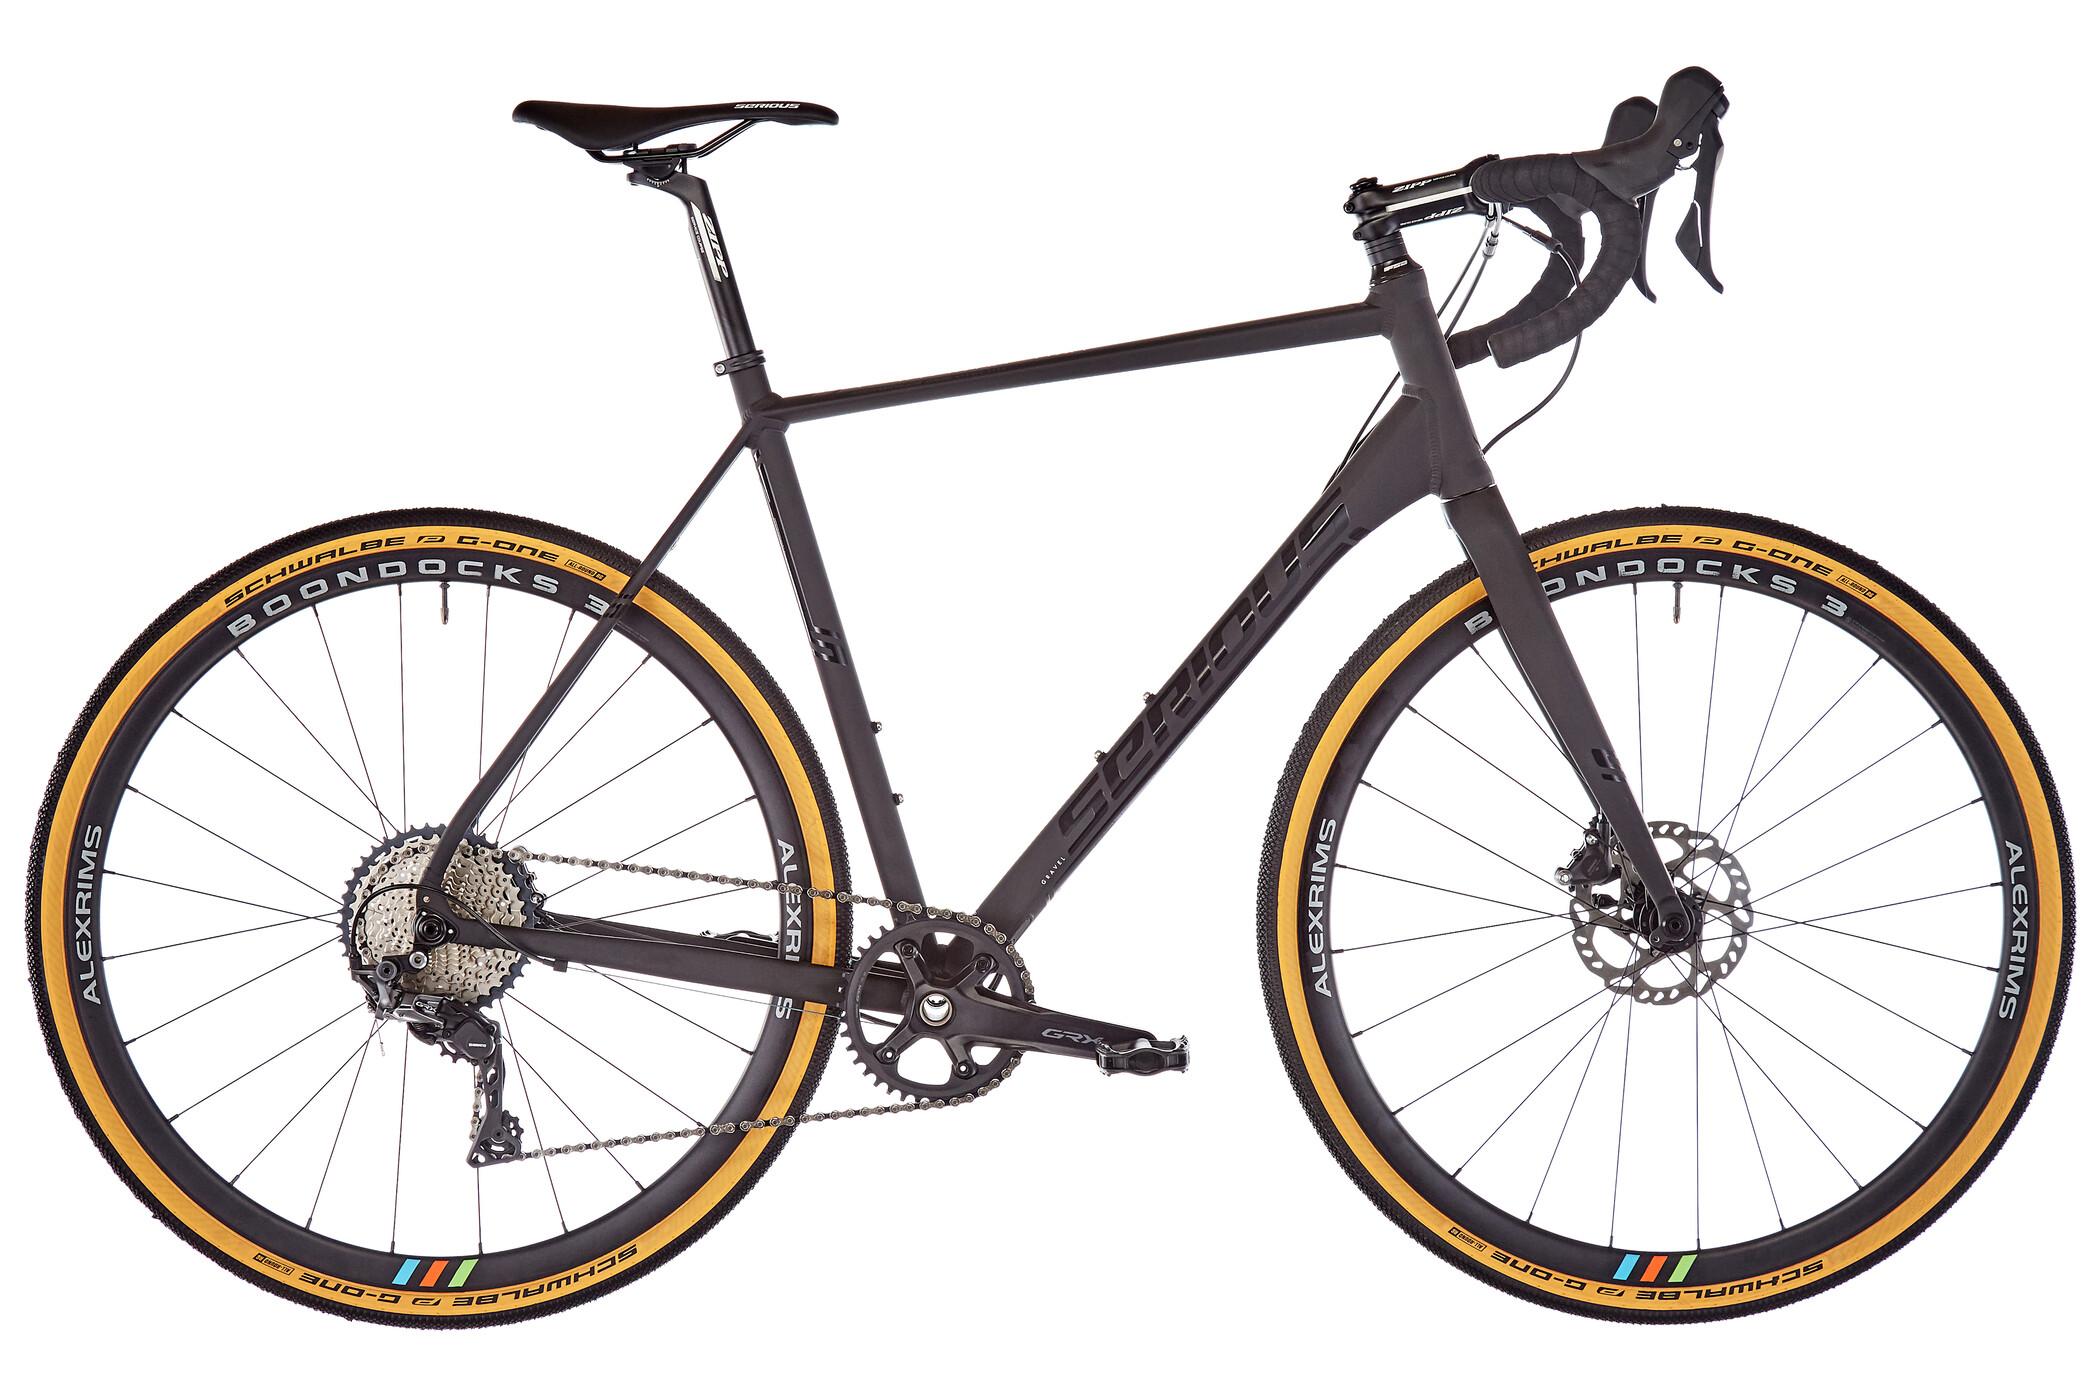 Serious Grafix GRX Pro, black/black (2019) | Road bikes